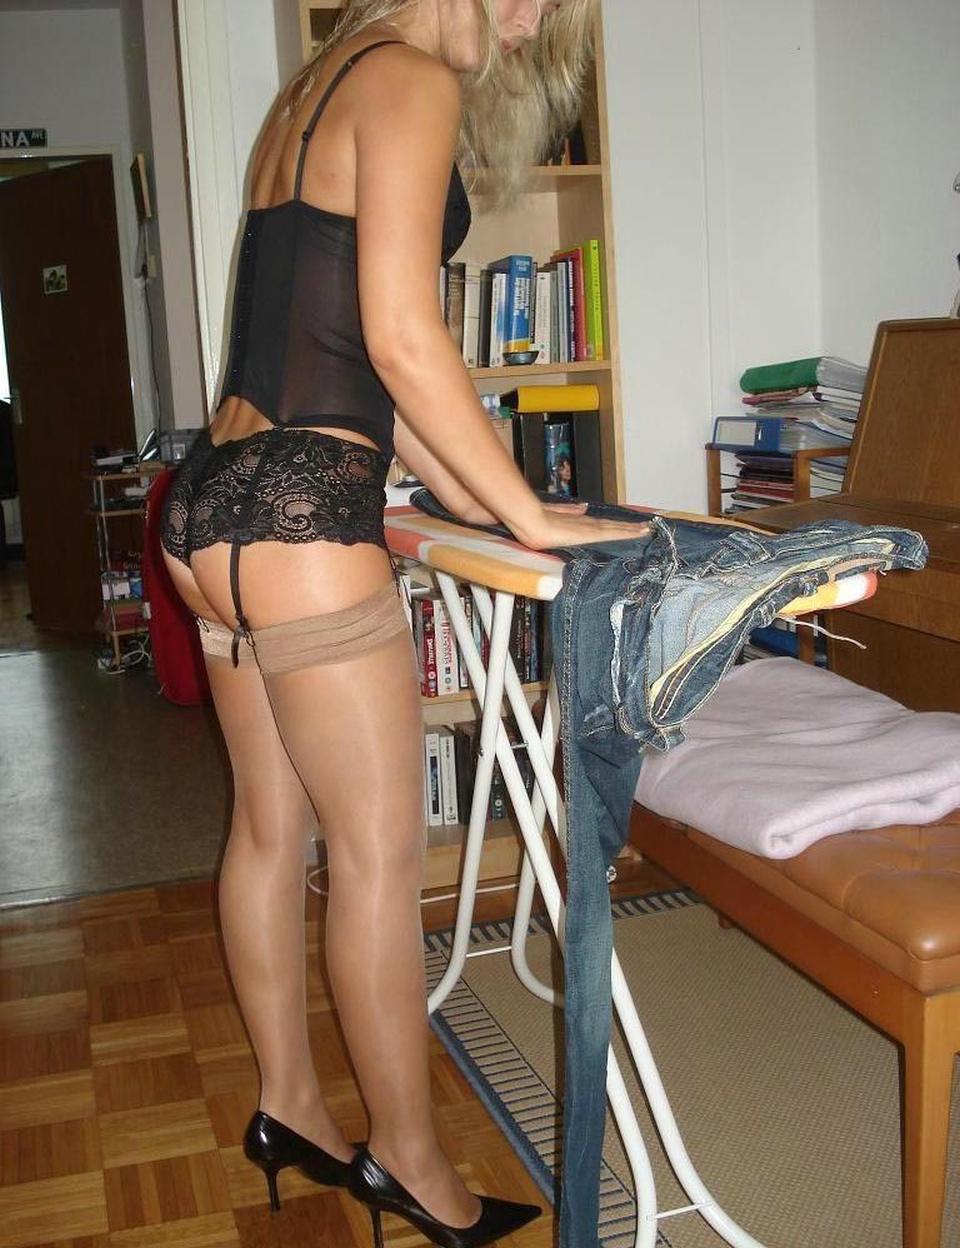 Симпатичная блондинка носит колготки на нагие буфера секс фото